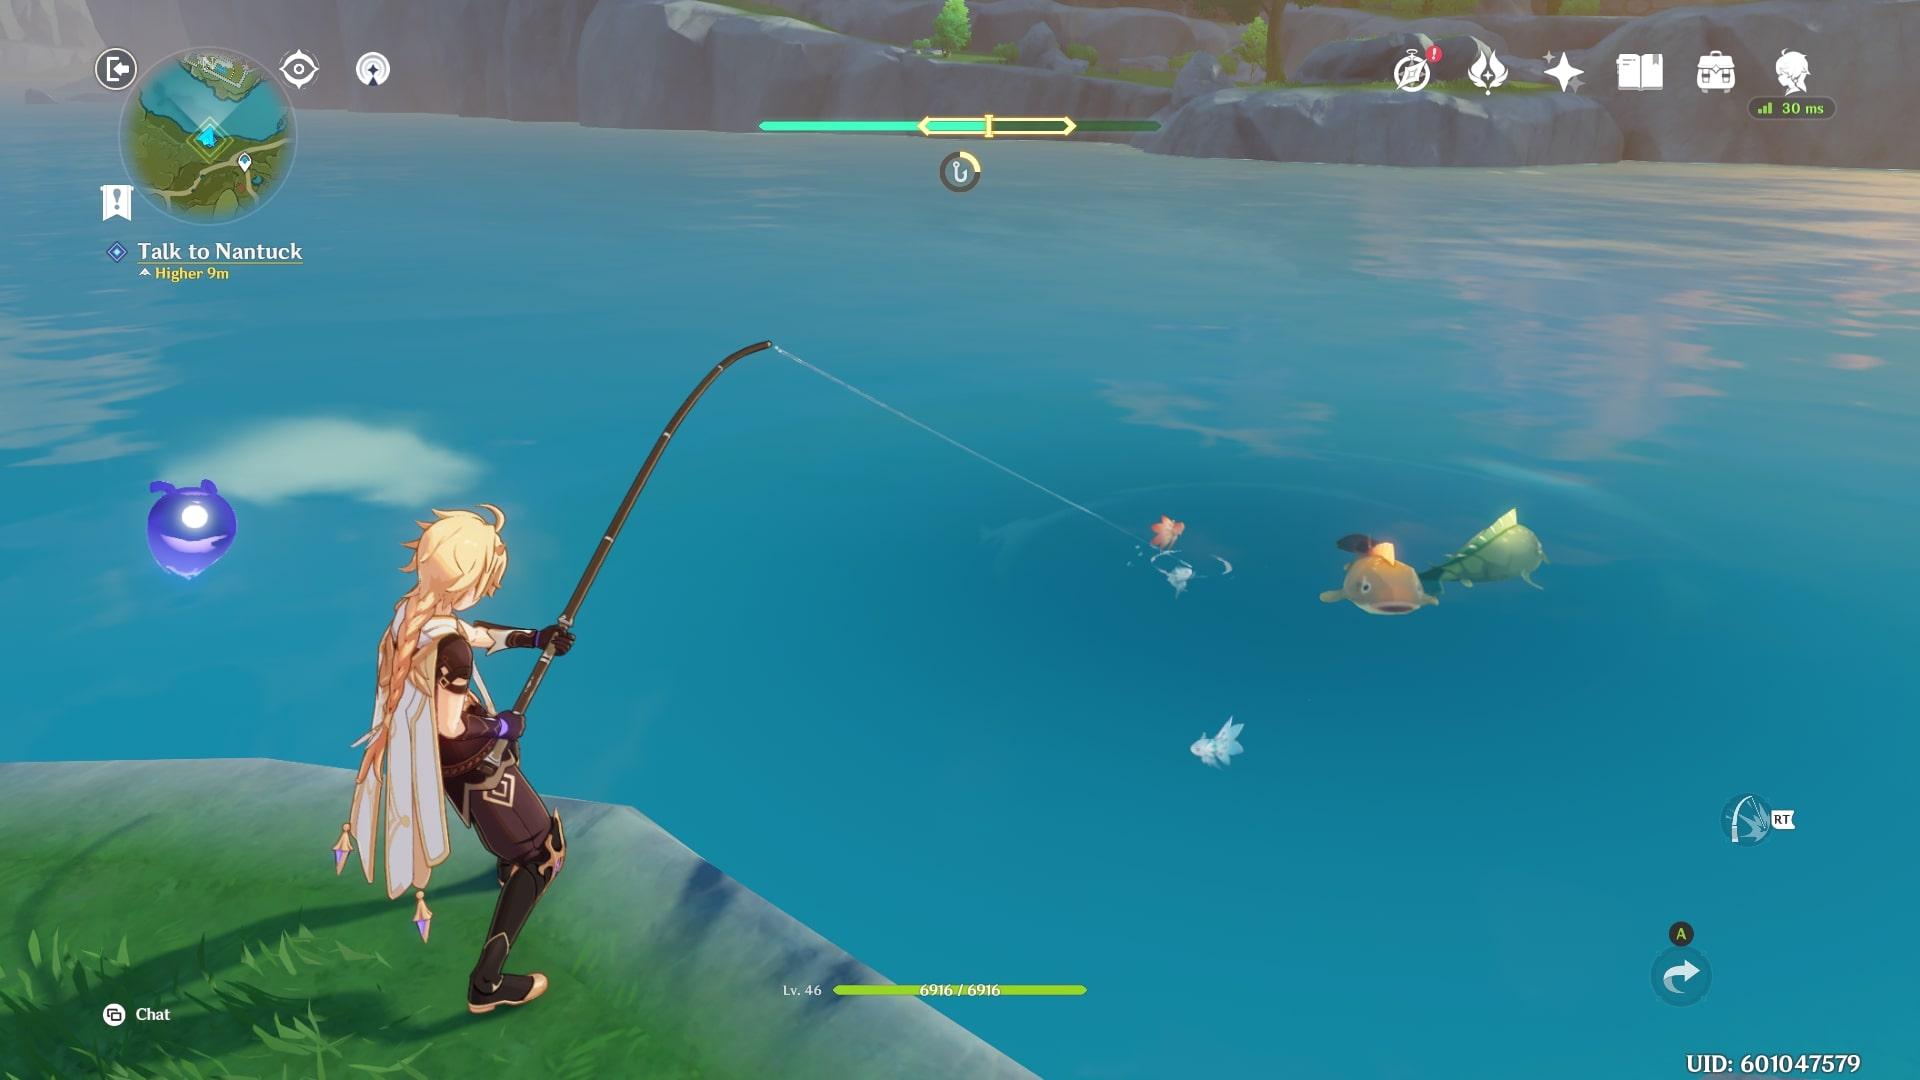 Mini juego de pesca de impacto Genshin